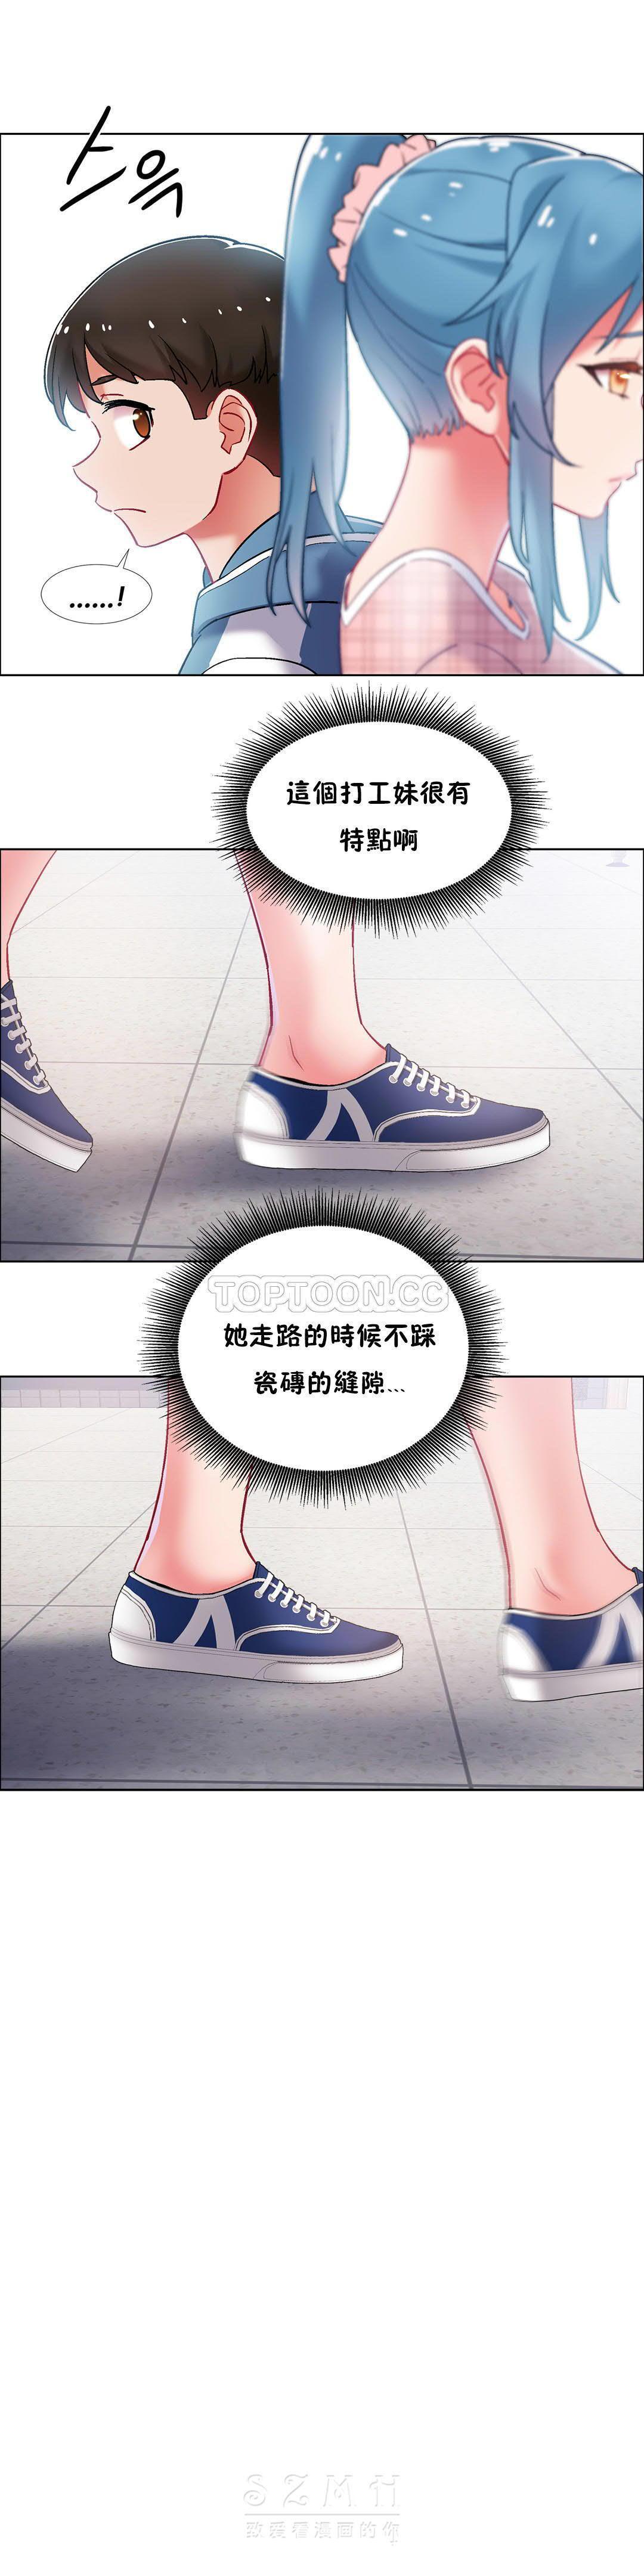 [Studio Wannabe] Rental Girls | 出租女郎 Ch. 33-58 [Chinese]  第二季 完结 37